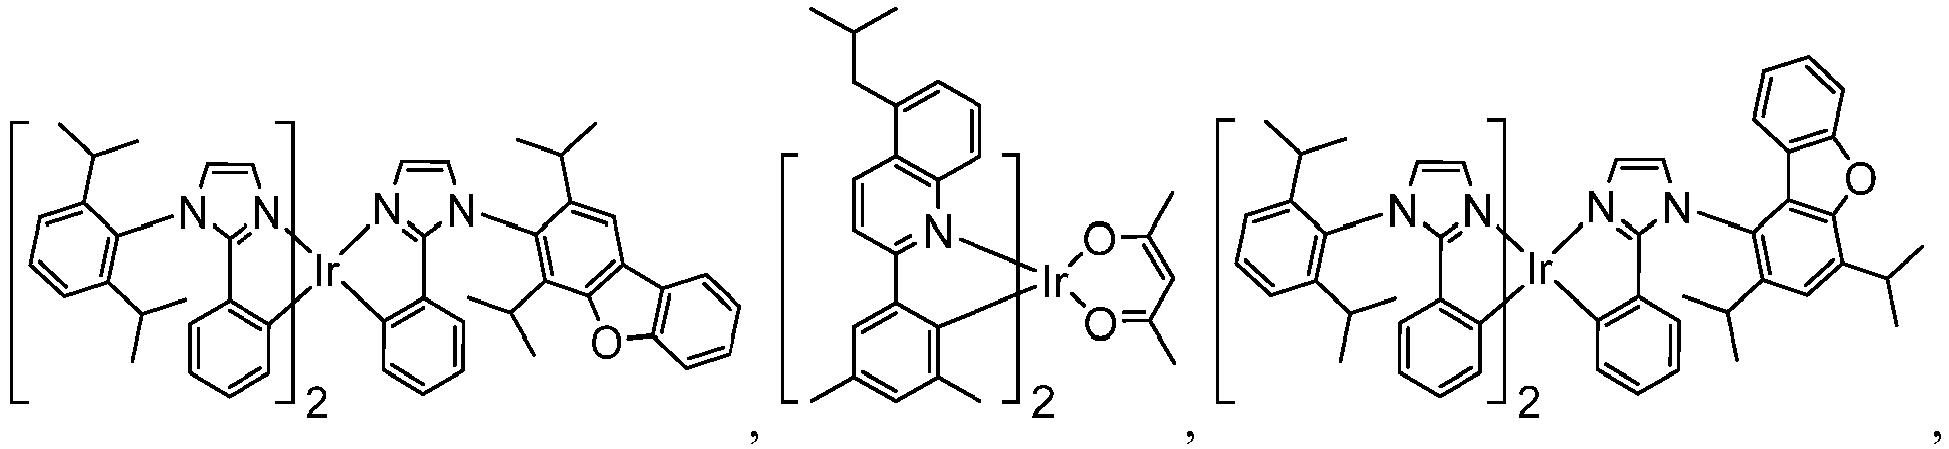 Figure imgb0921